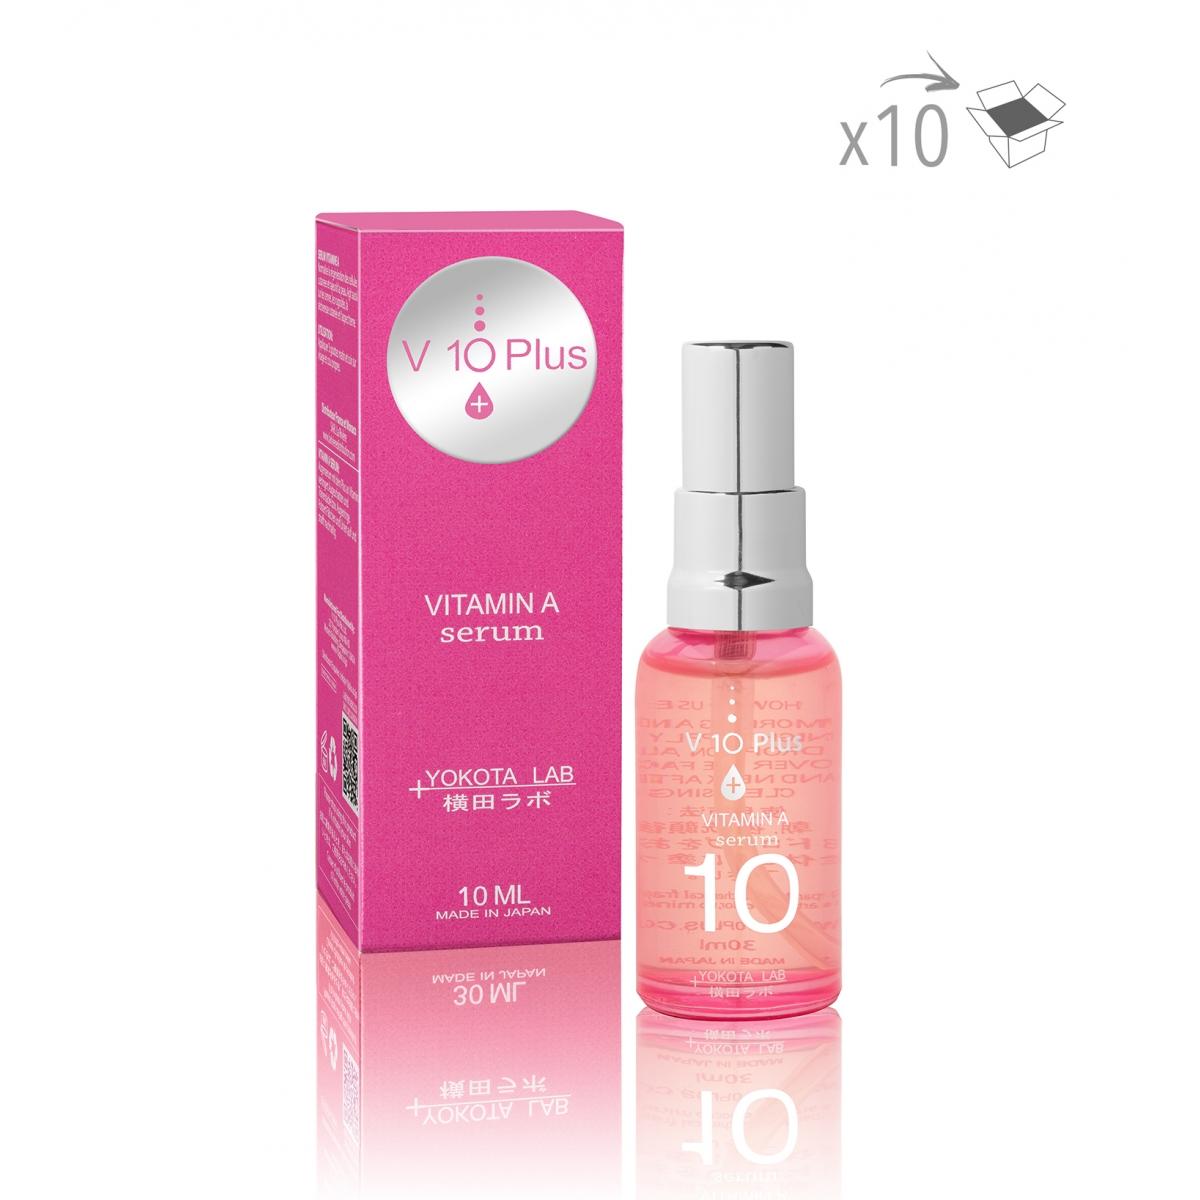 PRODUITS A LA REVENTE - VITAMINE A SERUM V10+ (10 ml) (x10)